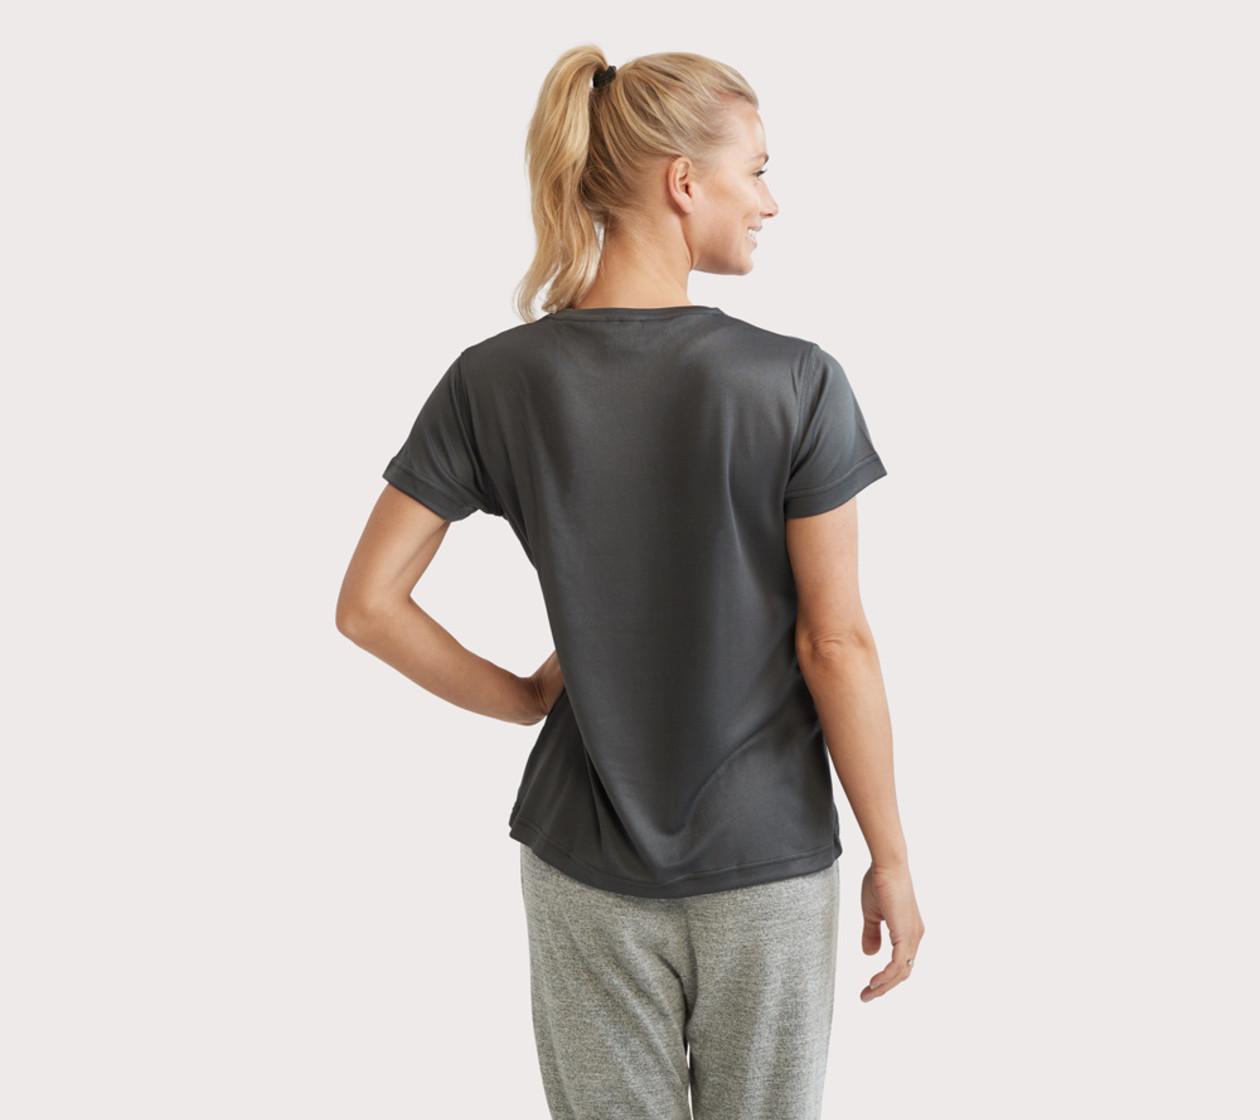 Camiseta Entrenamiento Mujer